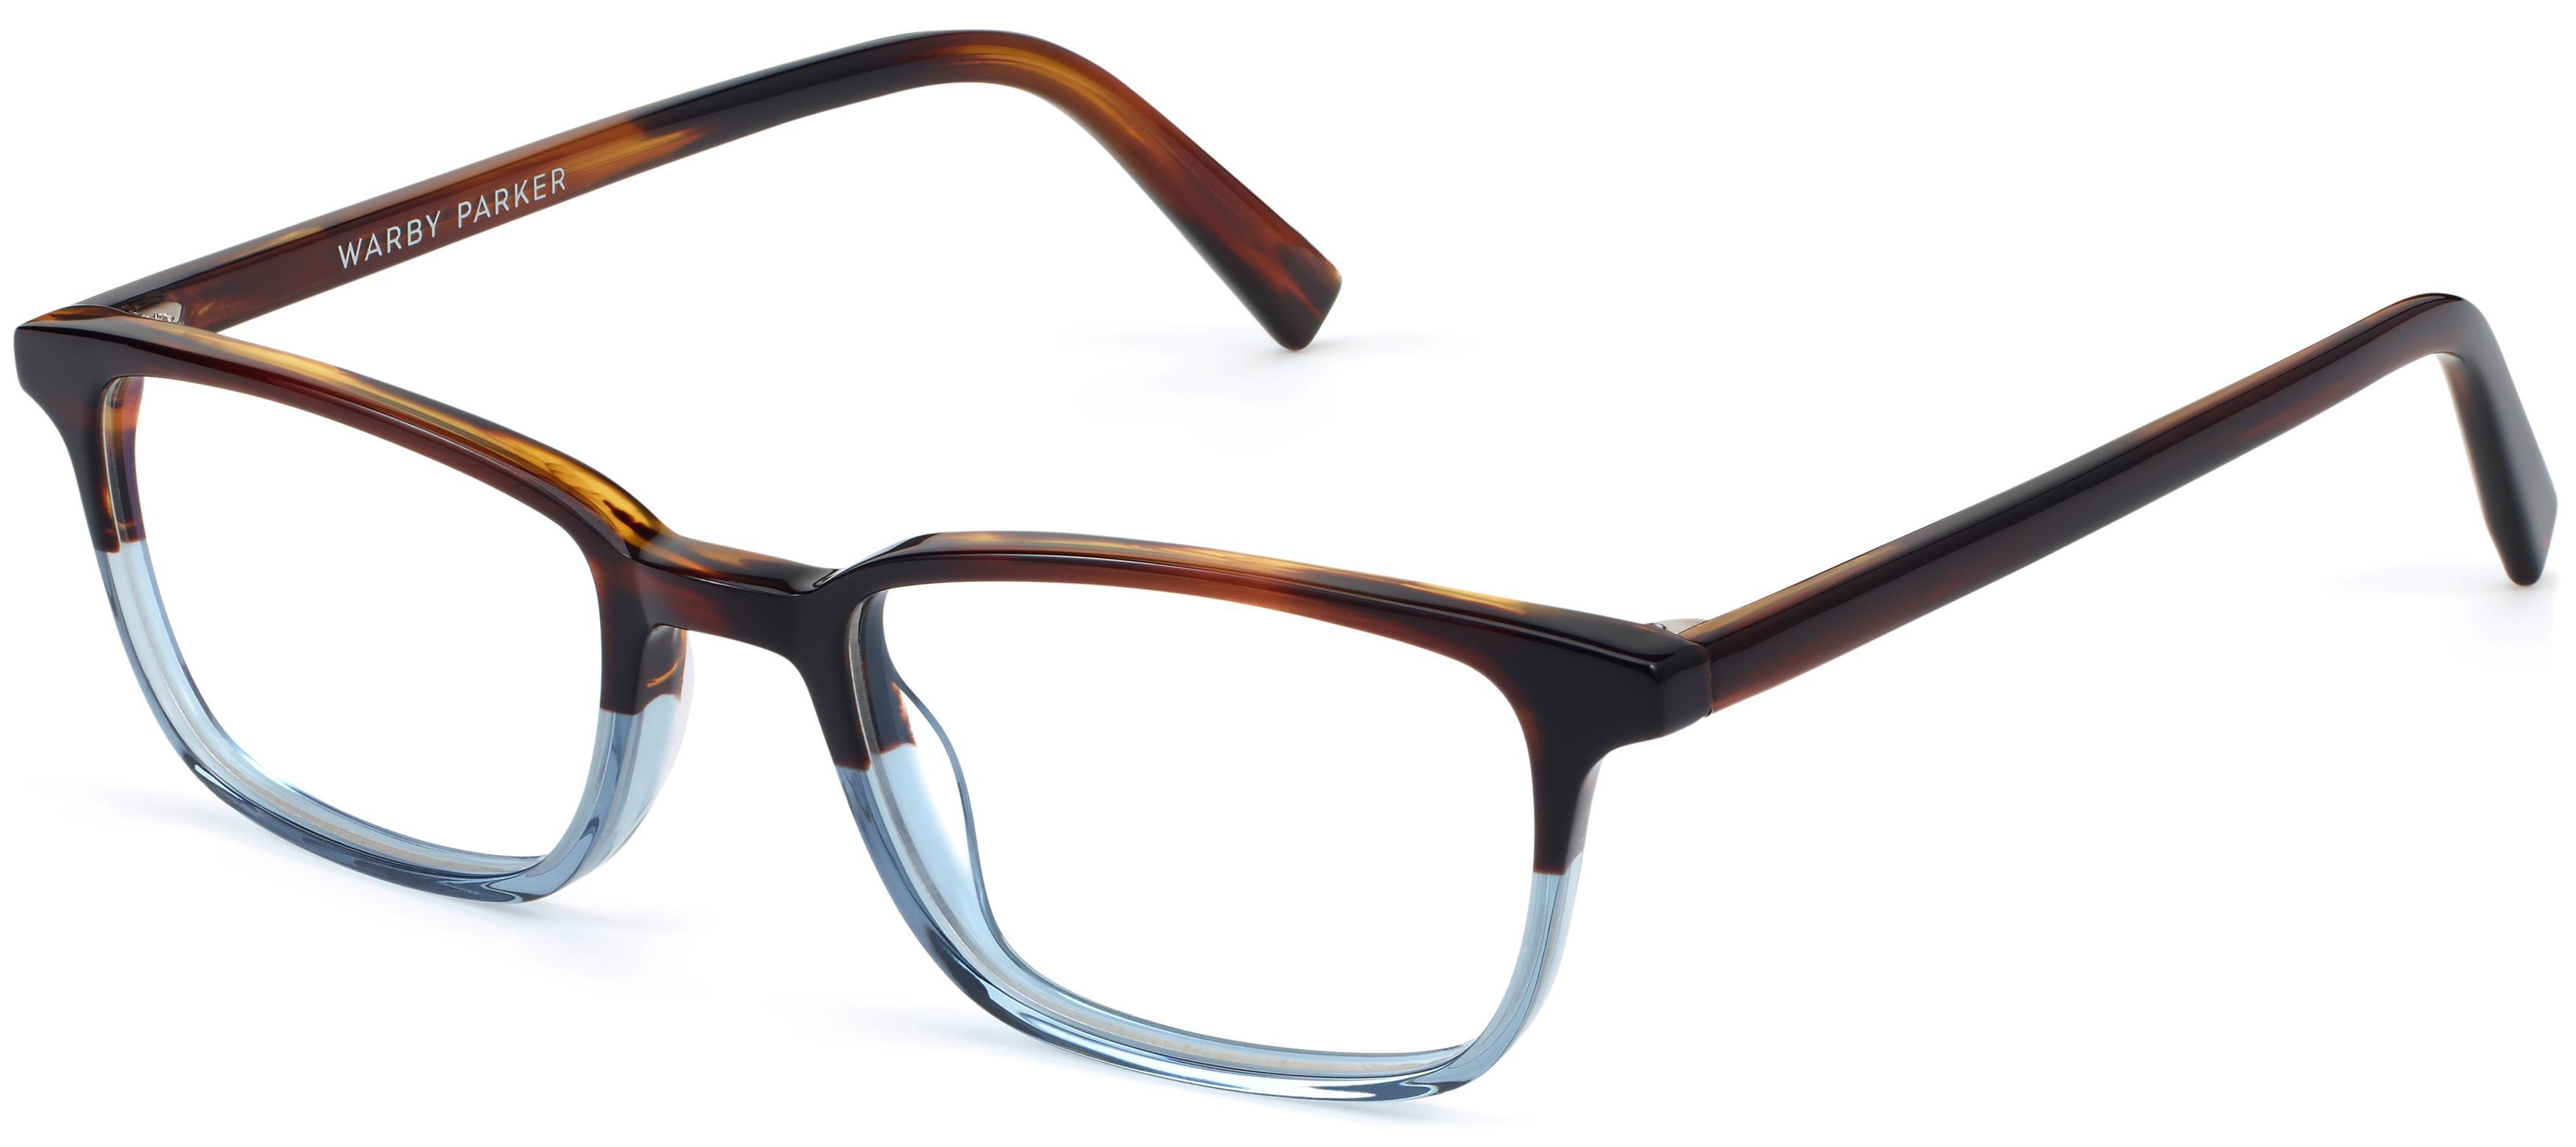 e4f1380c1af3 Oliver eyeglasses in eastern bluebird fade for men warby parker jpg  3500x1559 Eastern bluebird eyeglass eyeglasses